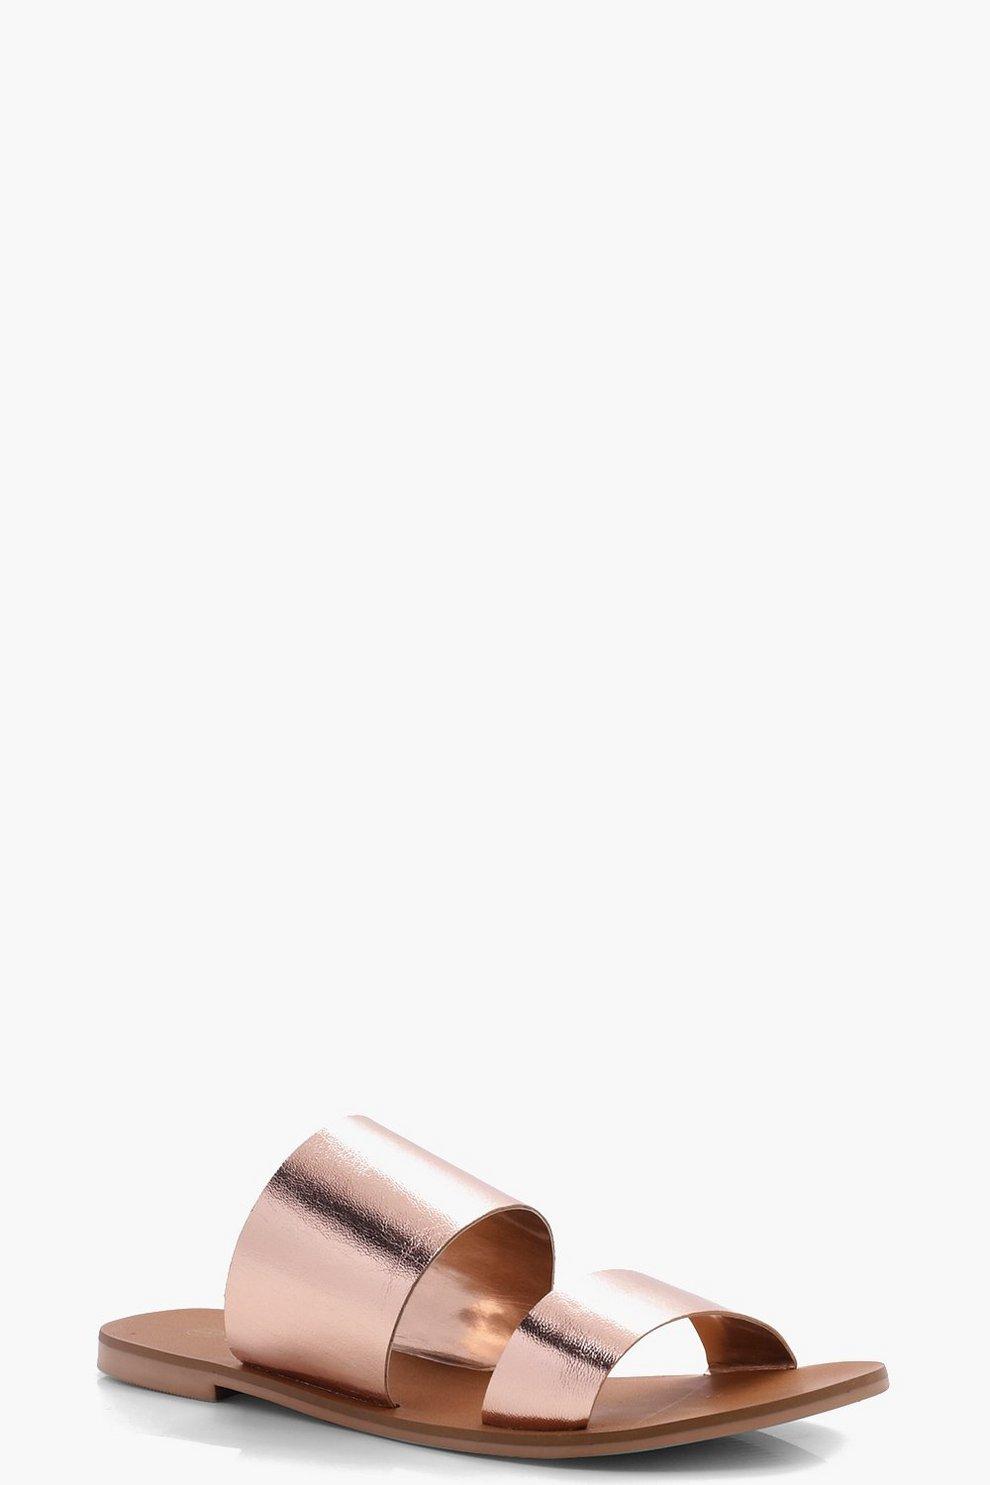 8e5126fba352 Leather Double Strap Sliders